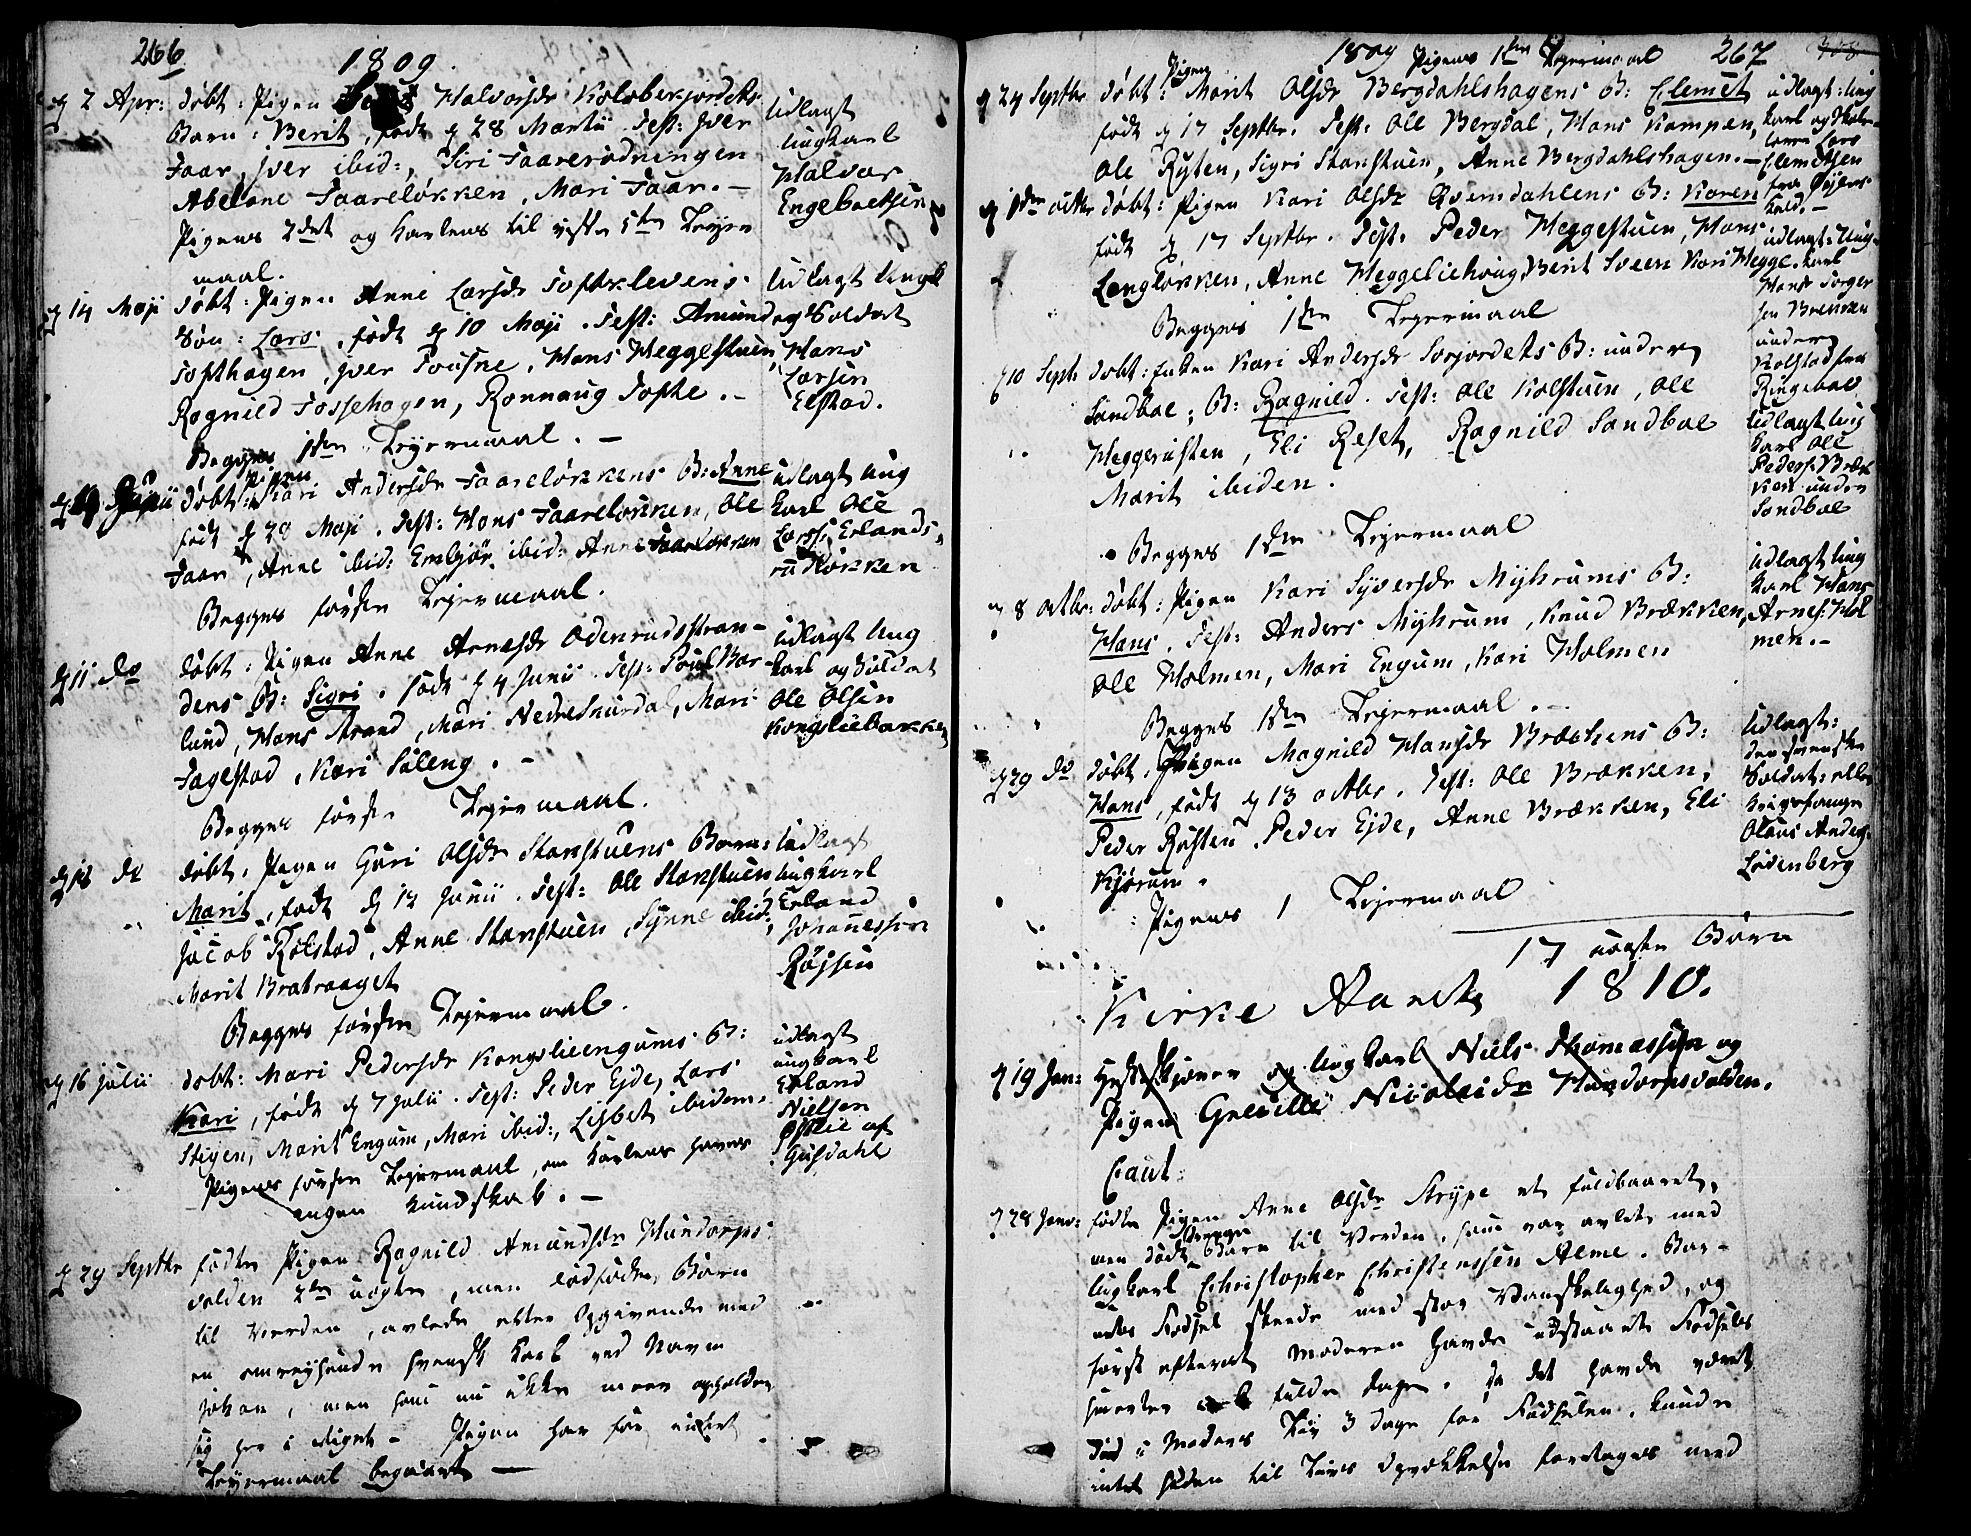 SAH, Fron prestekontor, H/Ha/Haa/L0001: Ministerialbok nr. 1, 1799-1816, s. 266-267